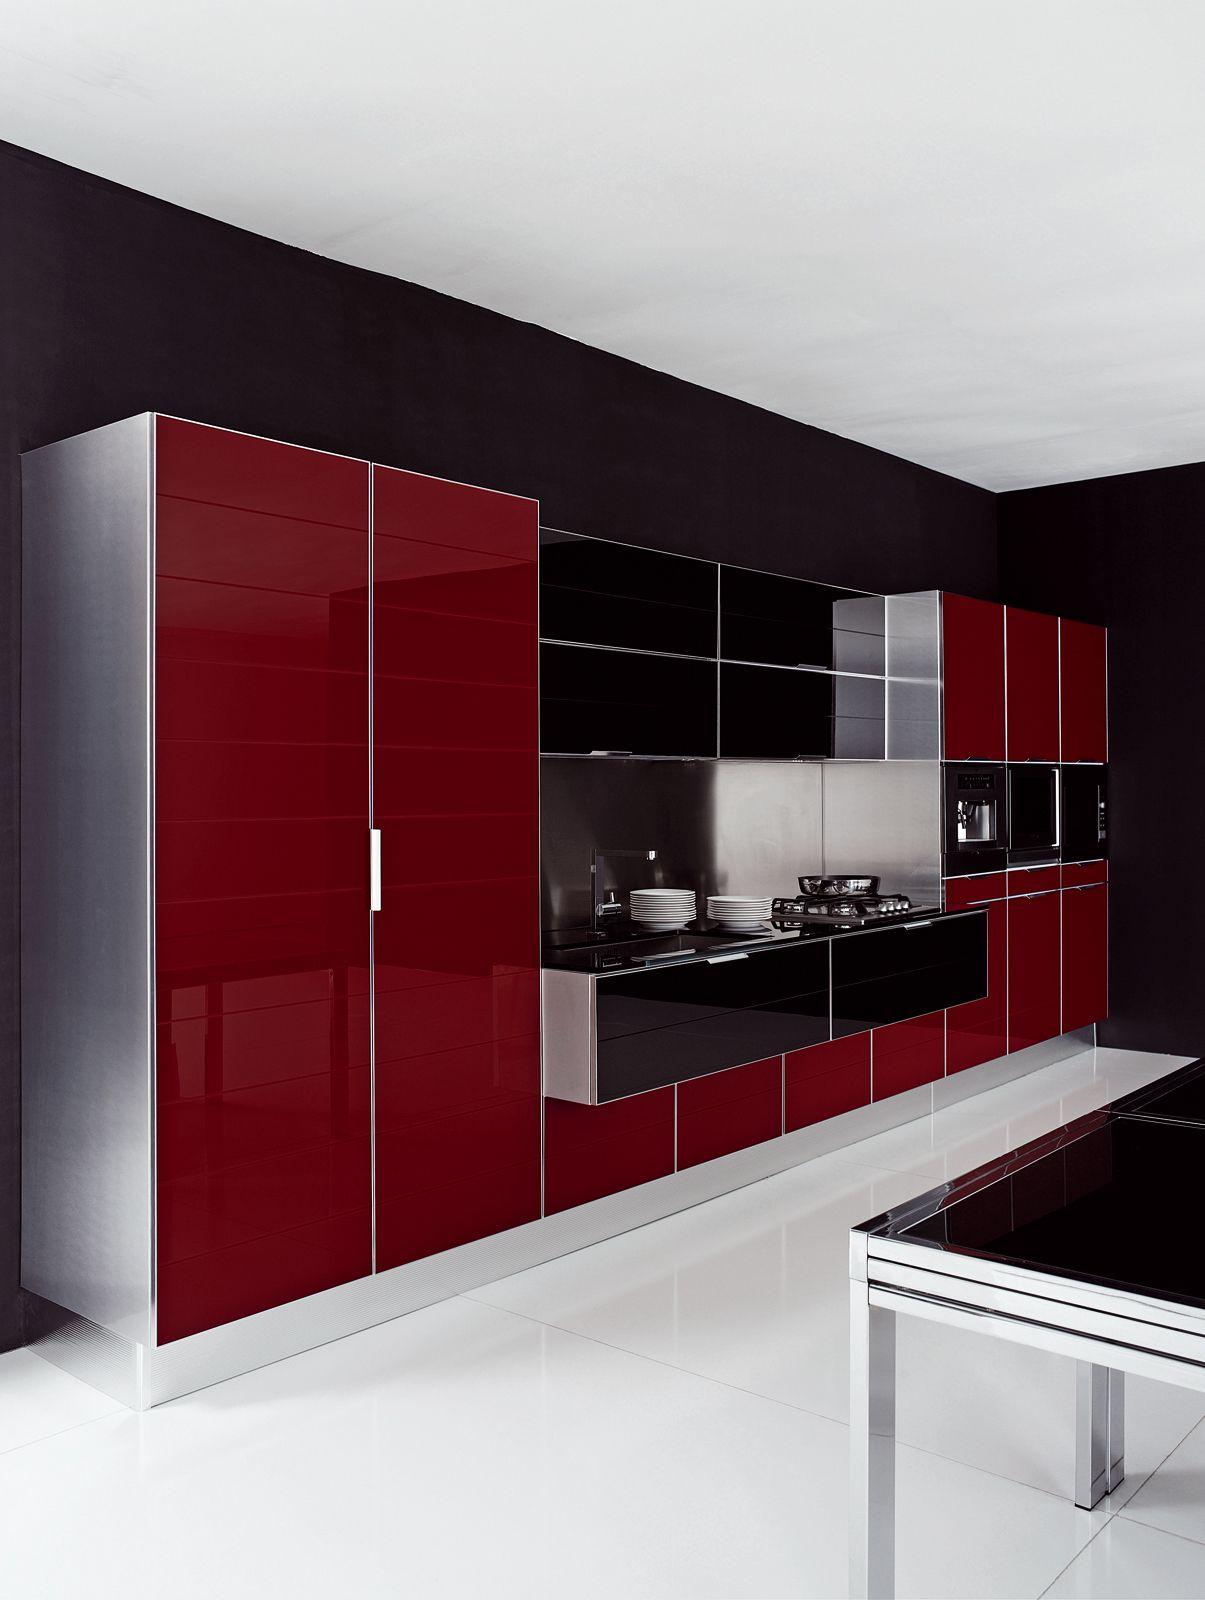 Volare Contemporary Design Contemporary Kitchen Cabinets Modern Kitchen Design Black Kitchen Decor